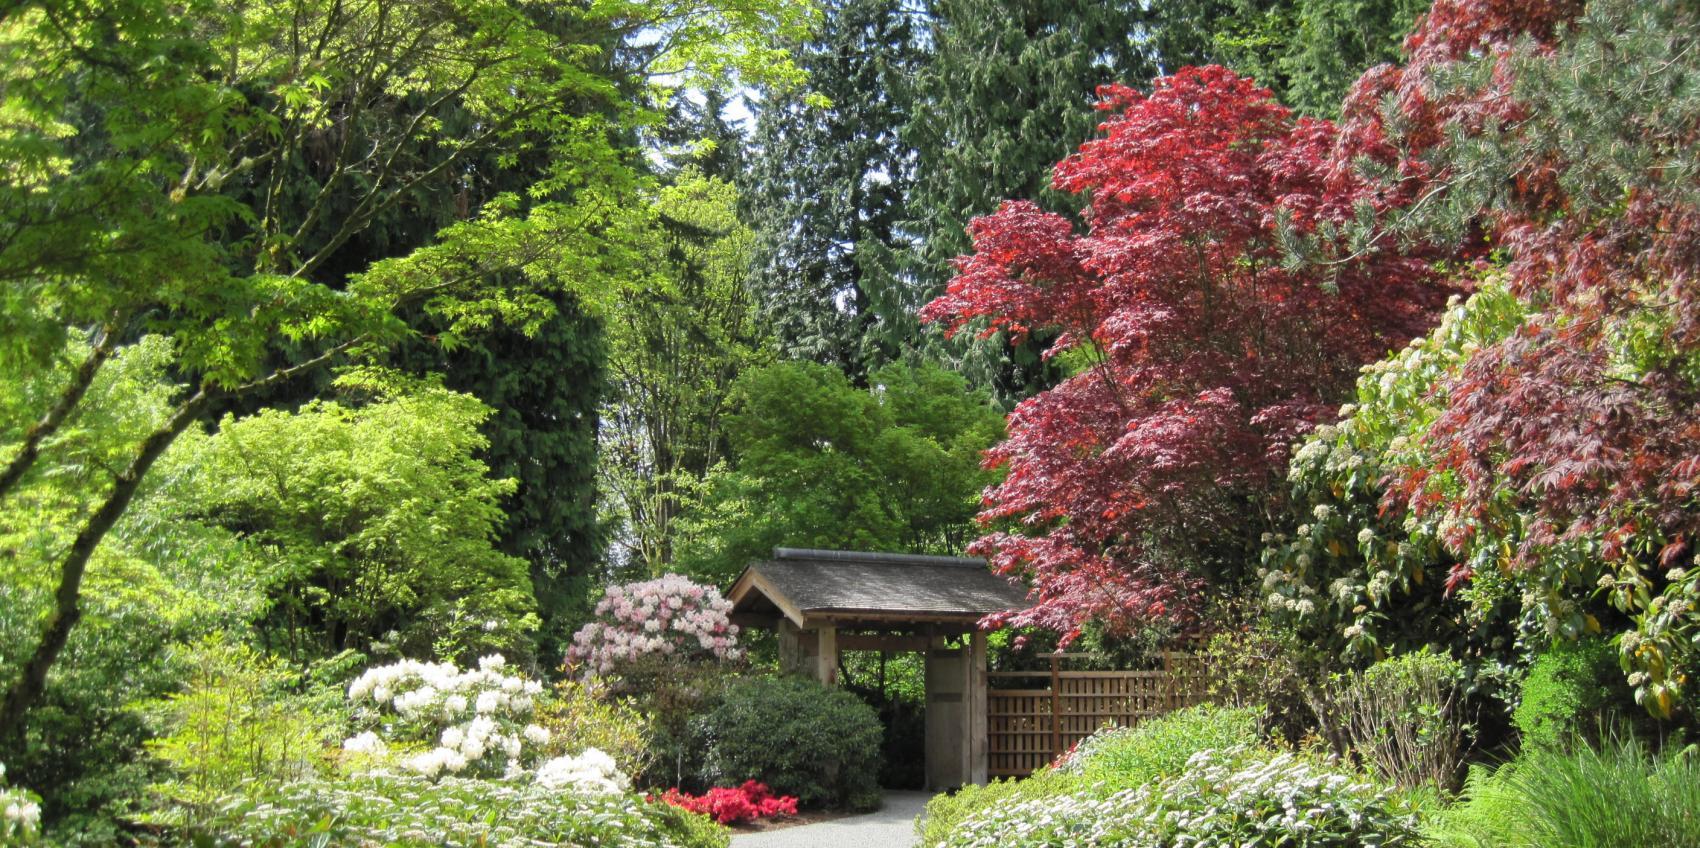 Bellevue Botanical Garden American Public Gardens Association